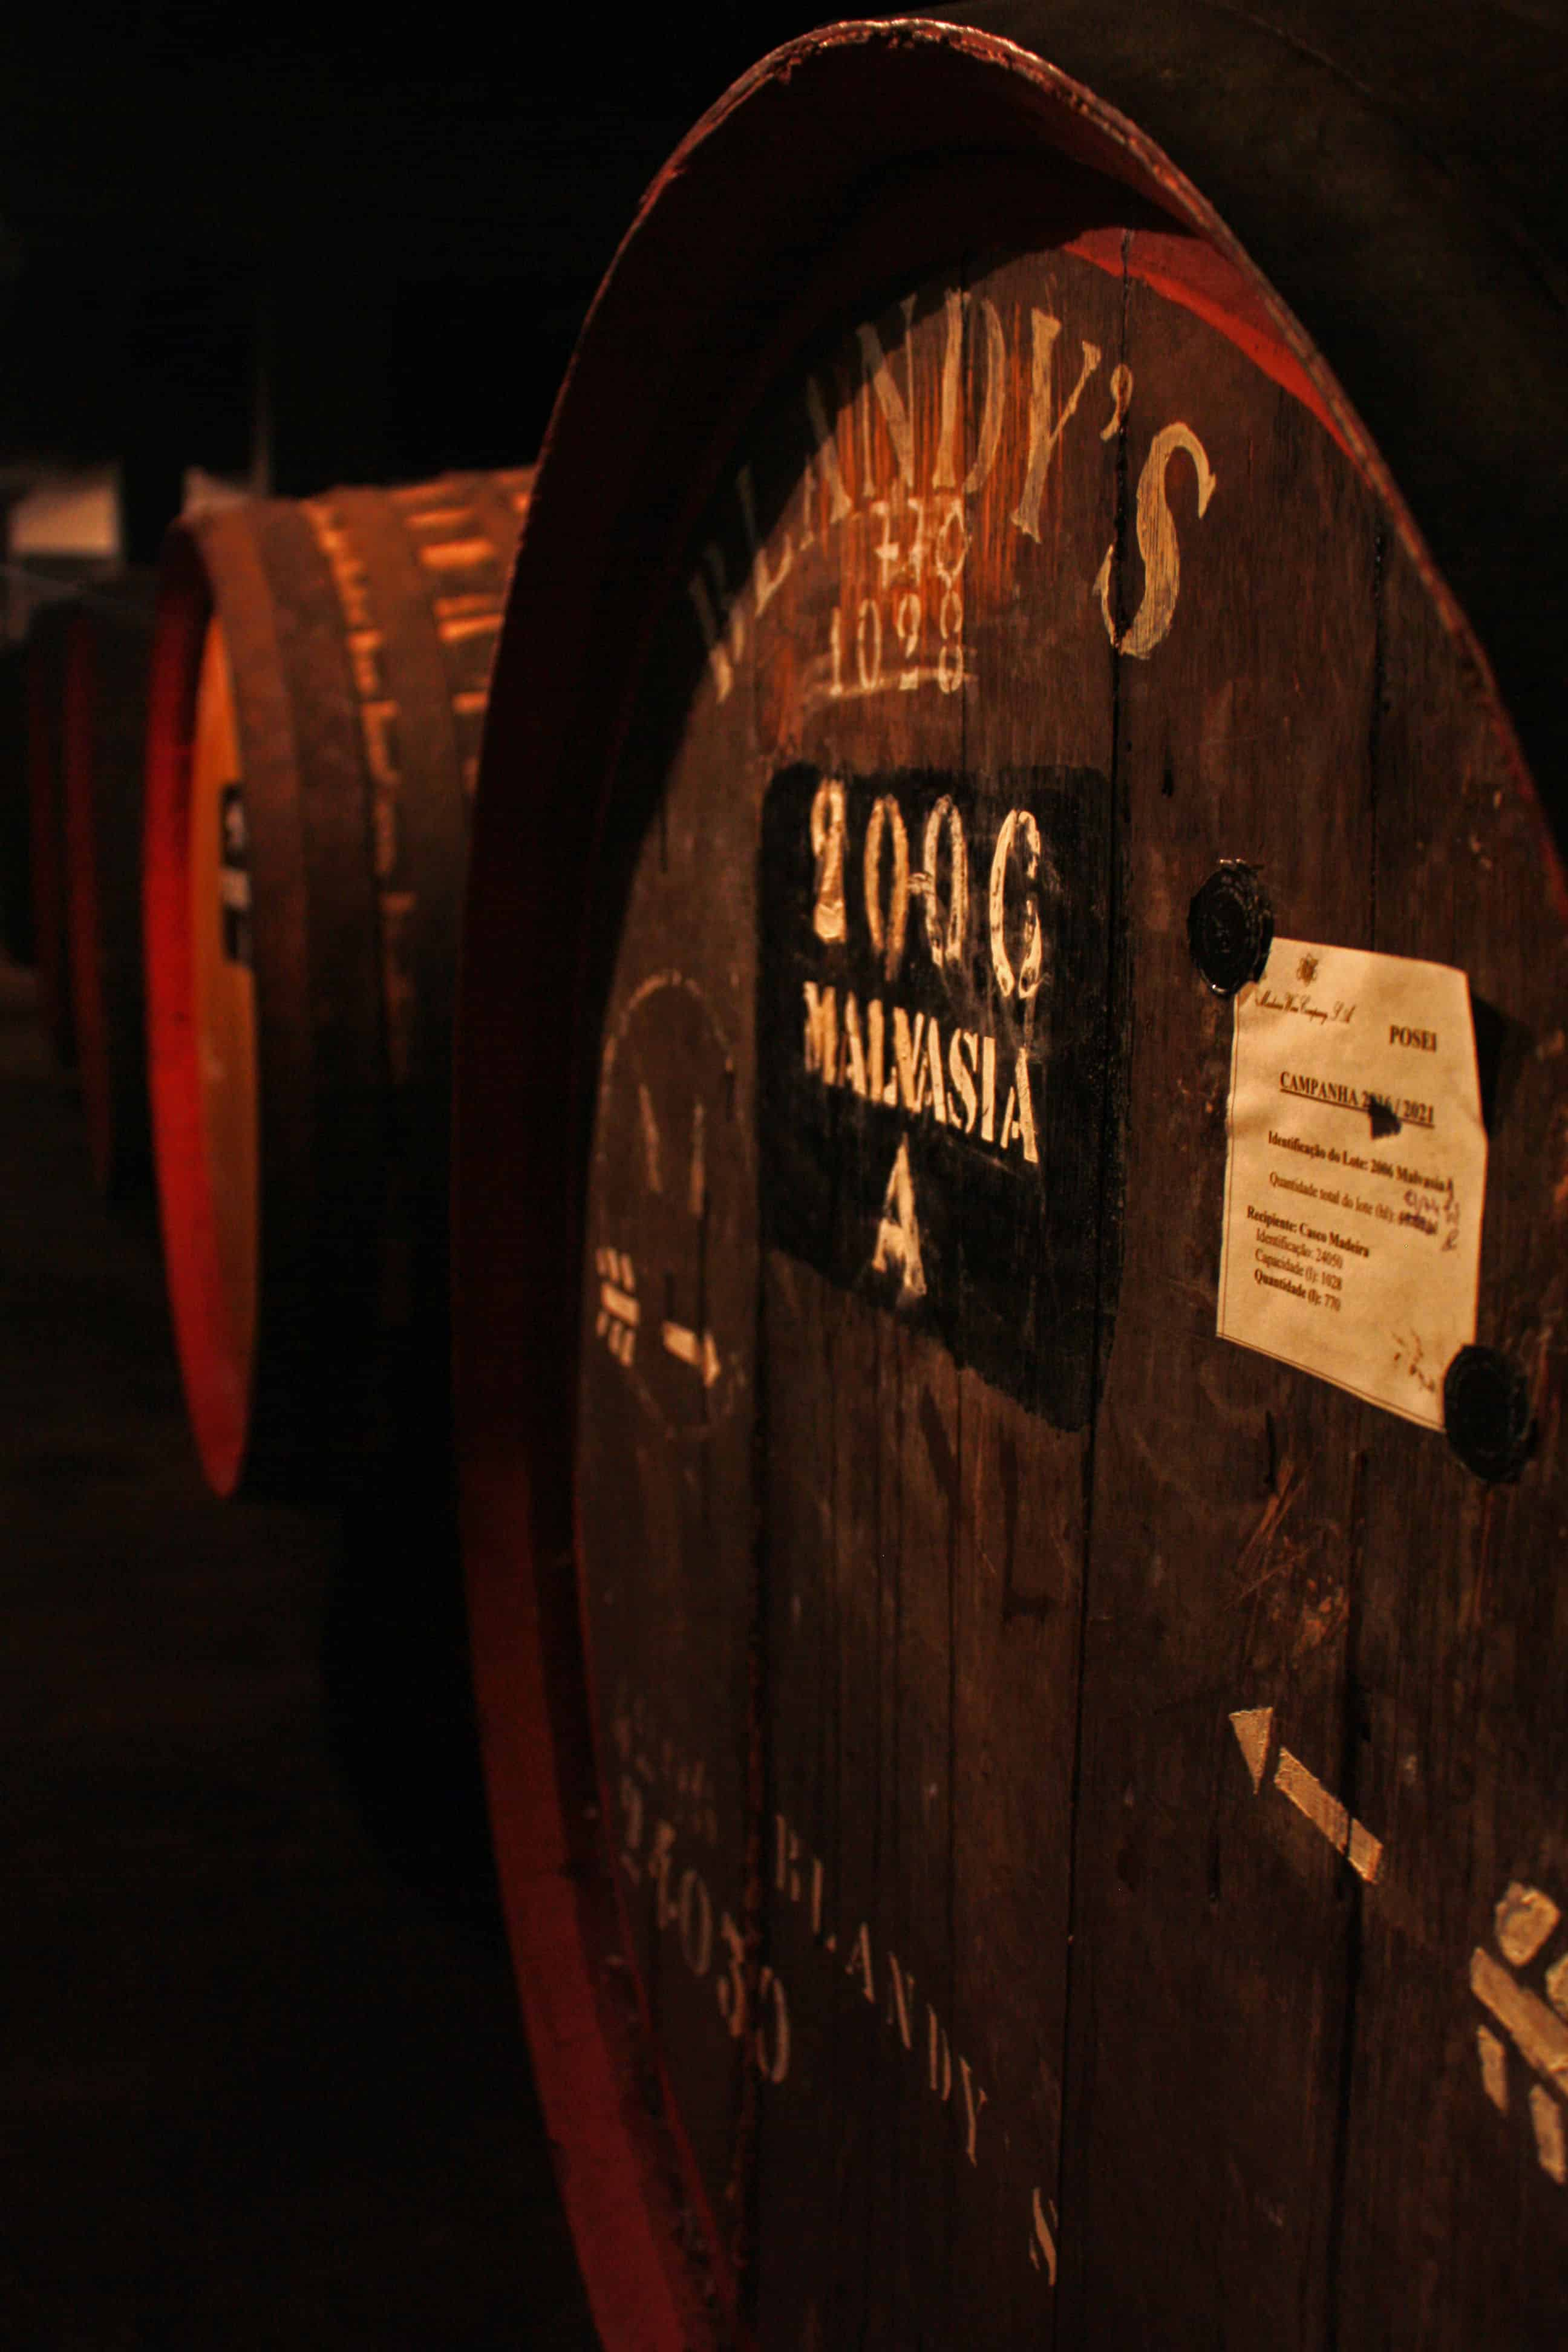 Blandy's Madeira wine barrels